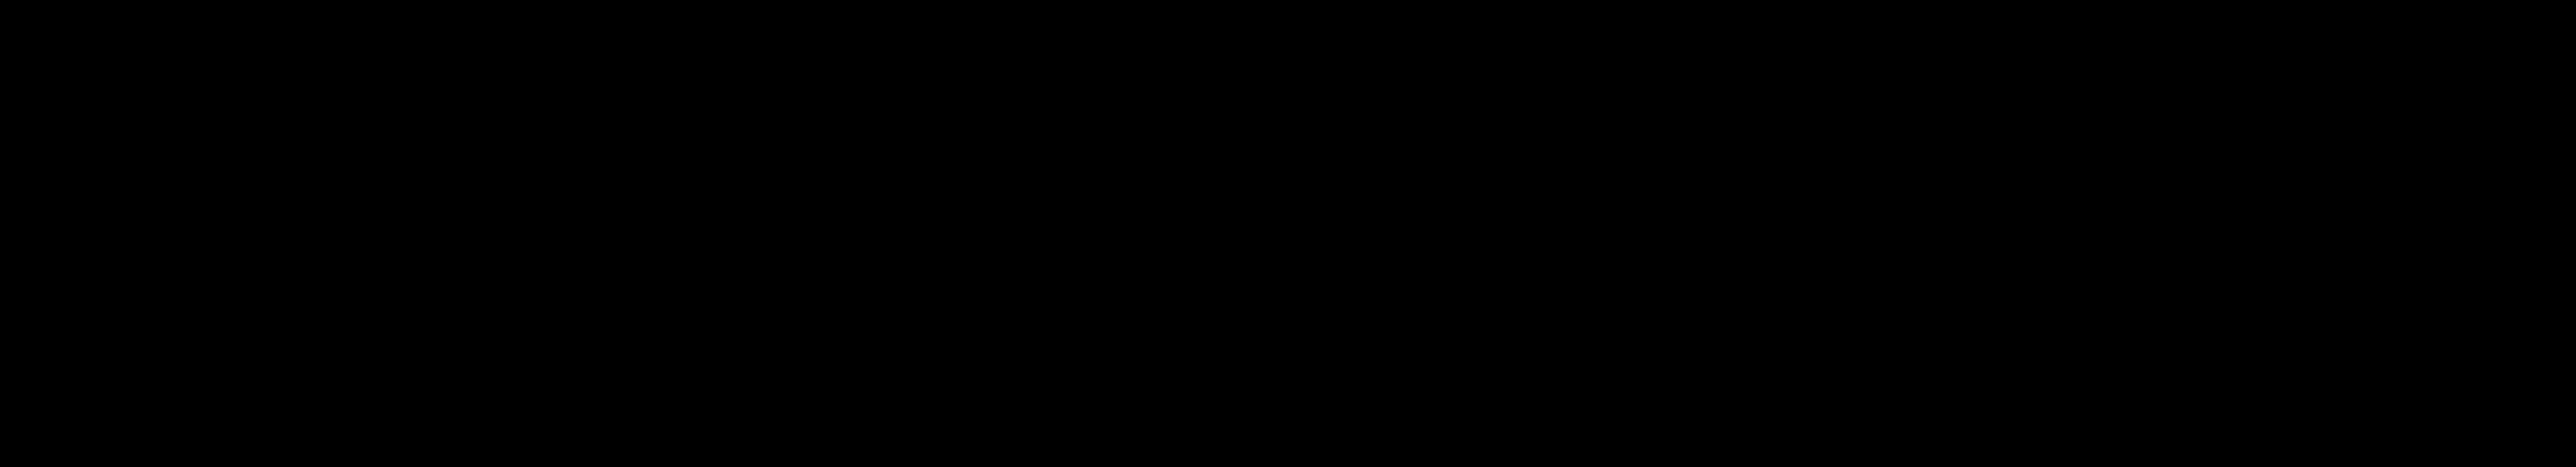 2-[[2-[[2-(Acetyloxy)benzoyl]oxy]benzoyl]oxy]benzoic acid 2-[[2-[(2-carboxyphenoxy)carbonyl]phenoxy]carbonyl]phenyl ester